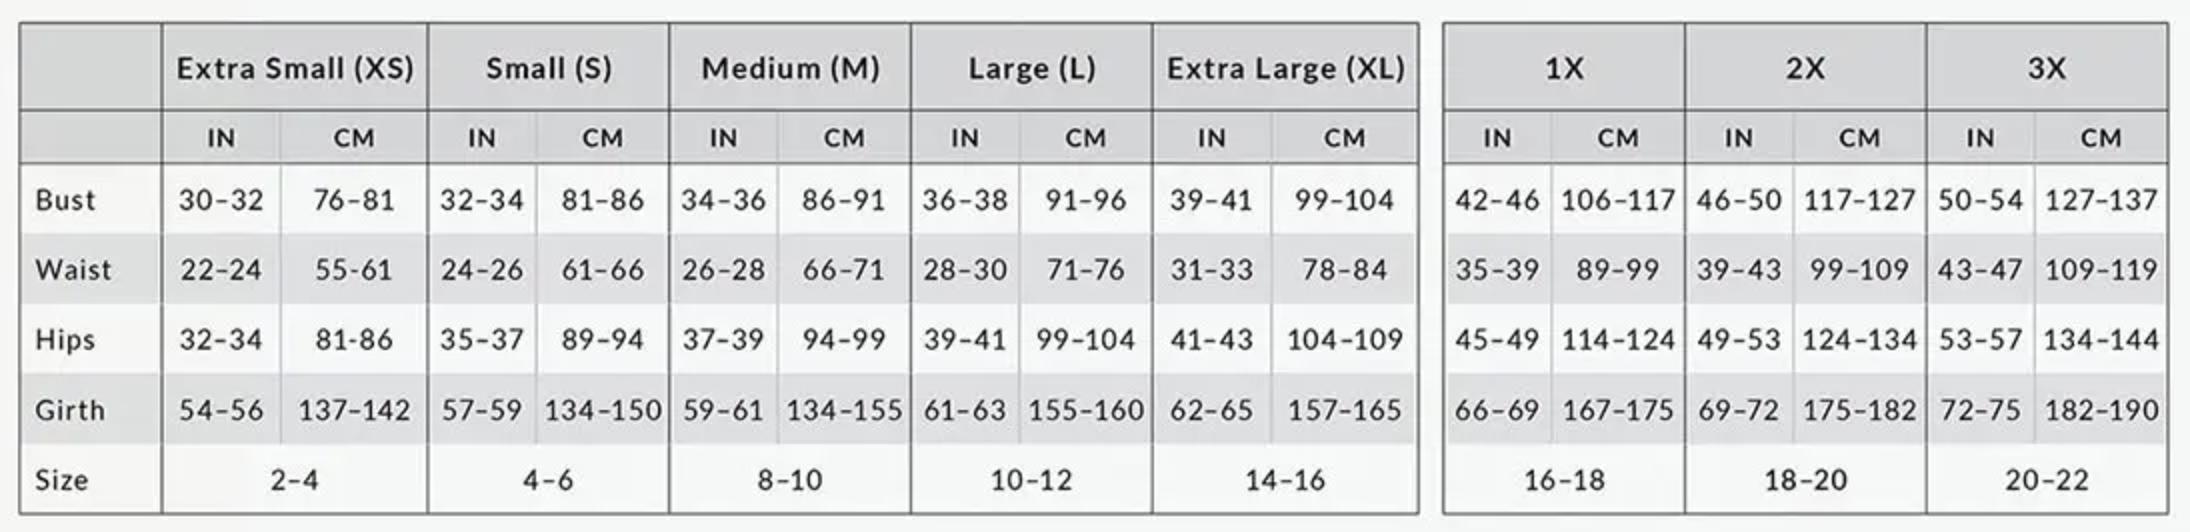 Women's Capezio Bodywear Size Guide